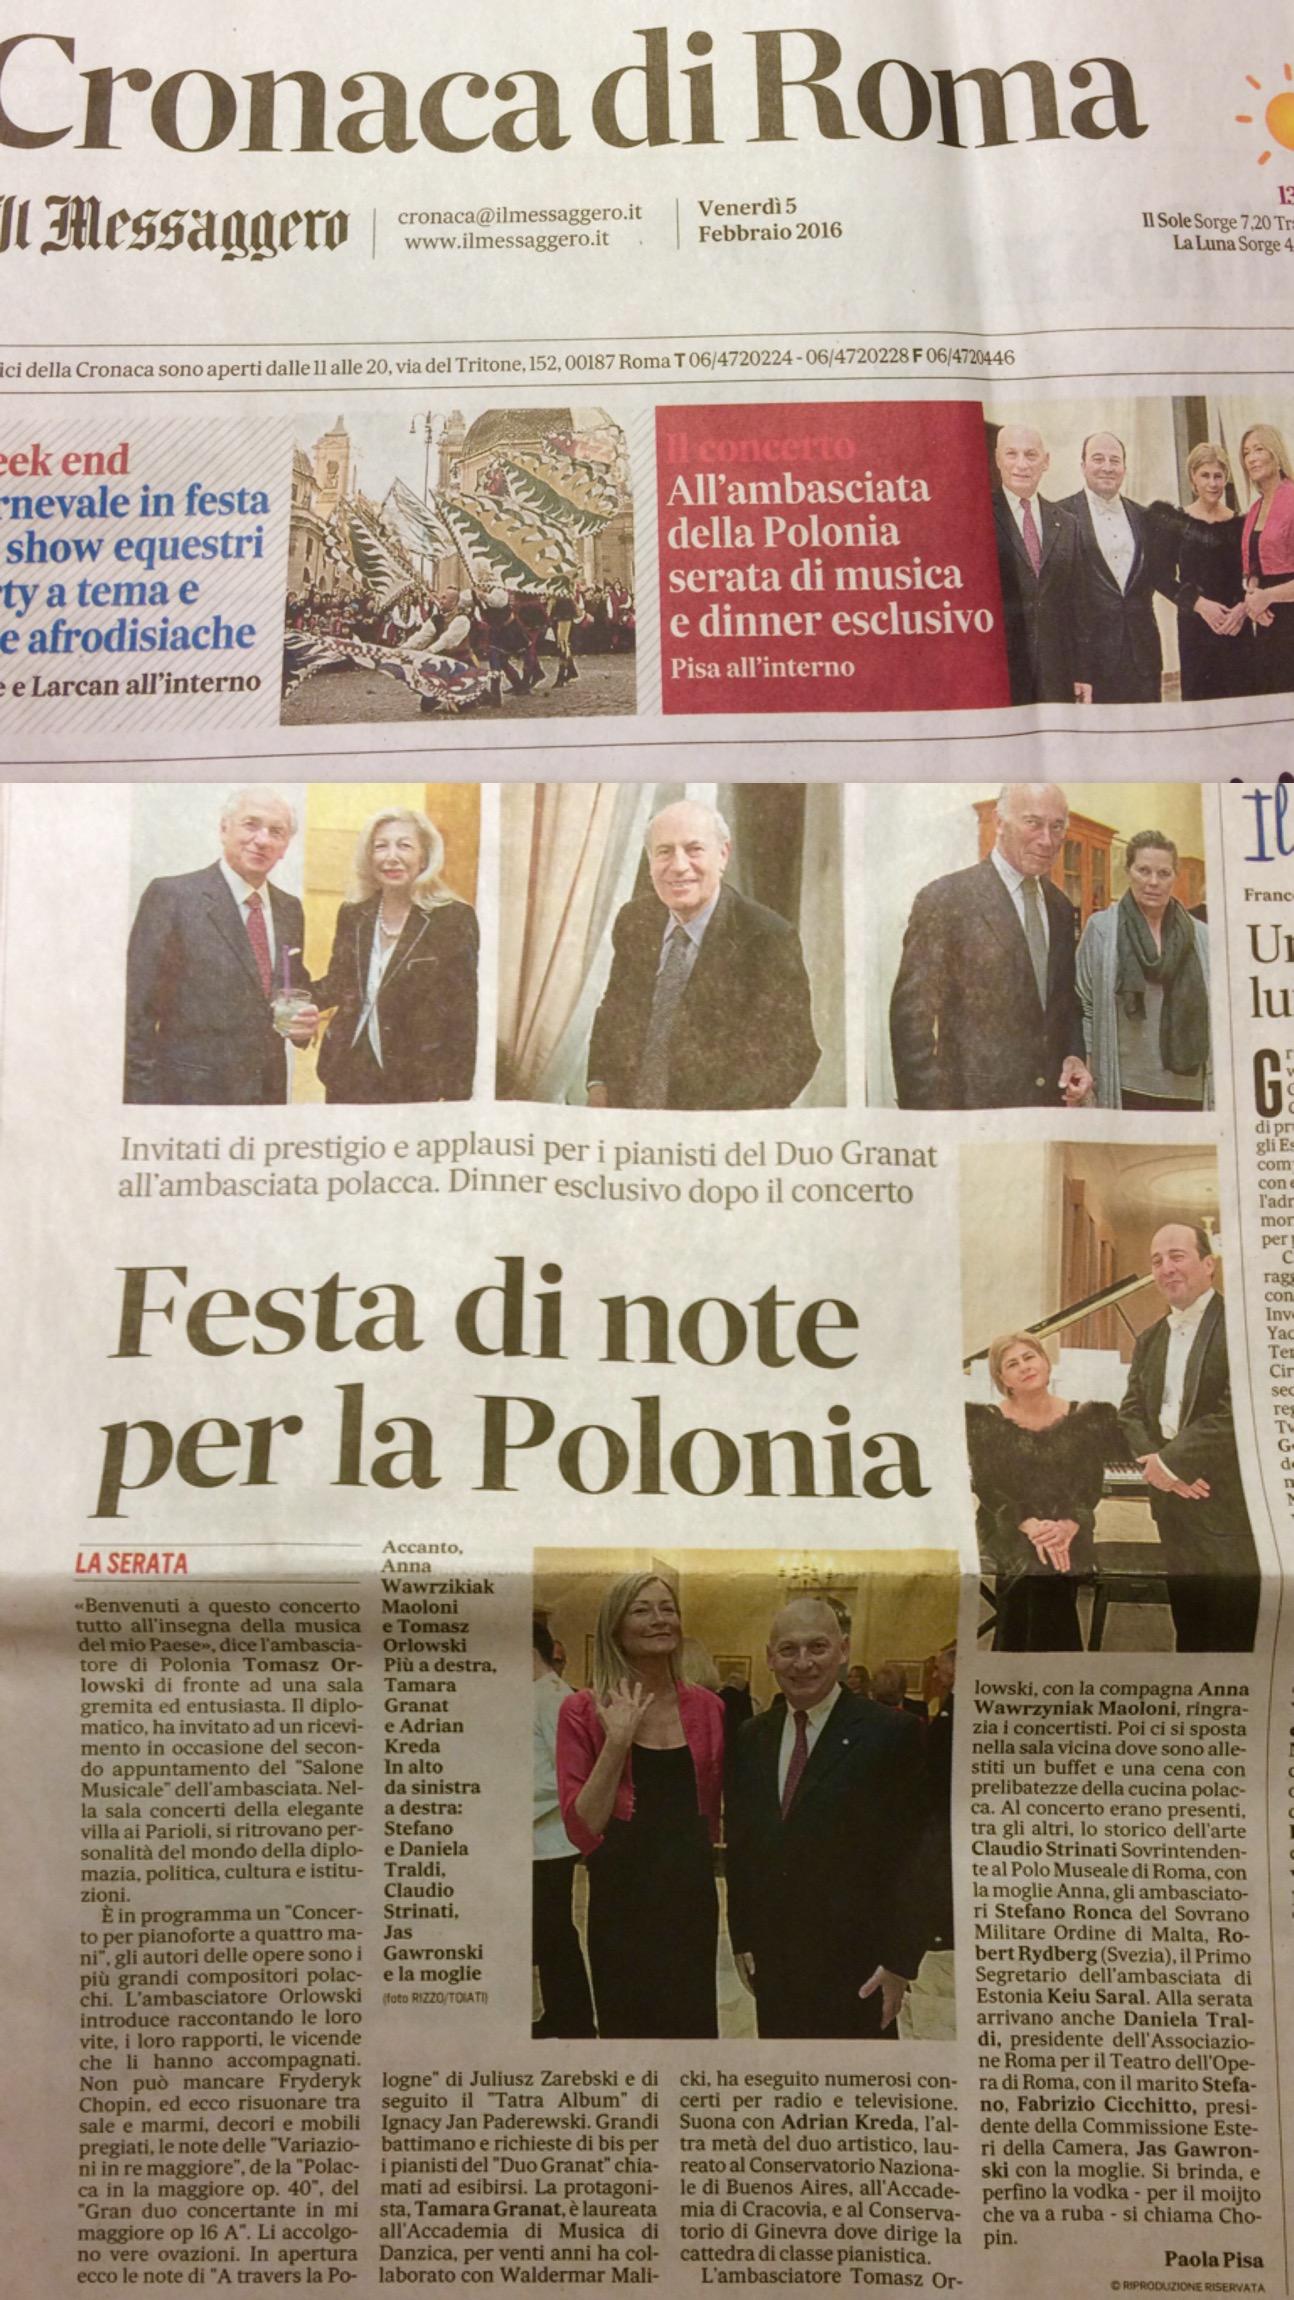 Cronaca di Roma, February 5, 2016